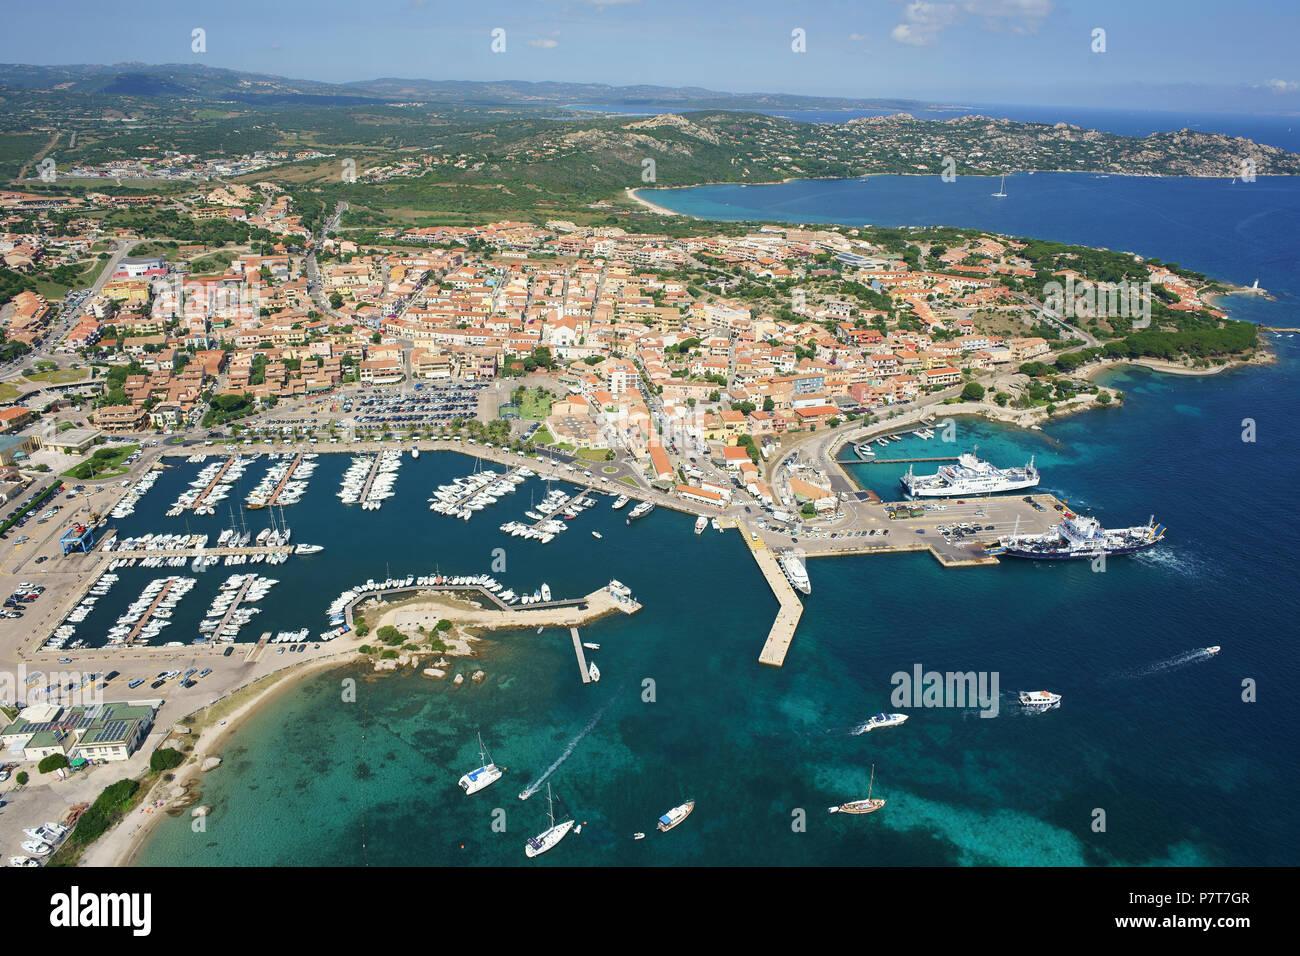 CITY OF PALAU AND ITS MARINA (aerial view). Gallura, Province of Olbia-Tempio, Sardinia, Italy. - Stock Image